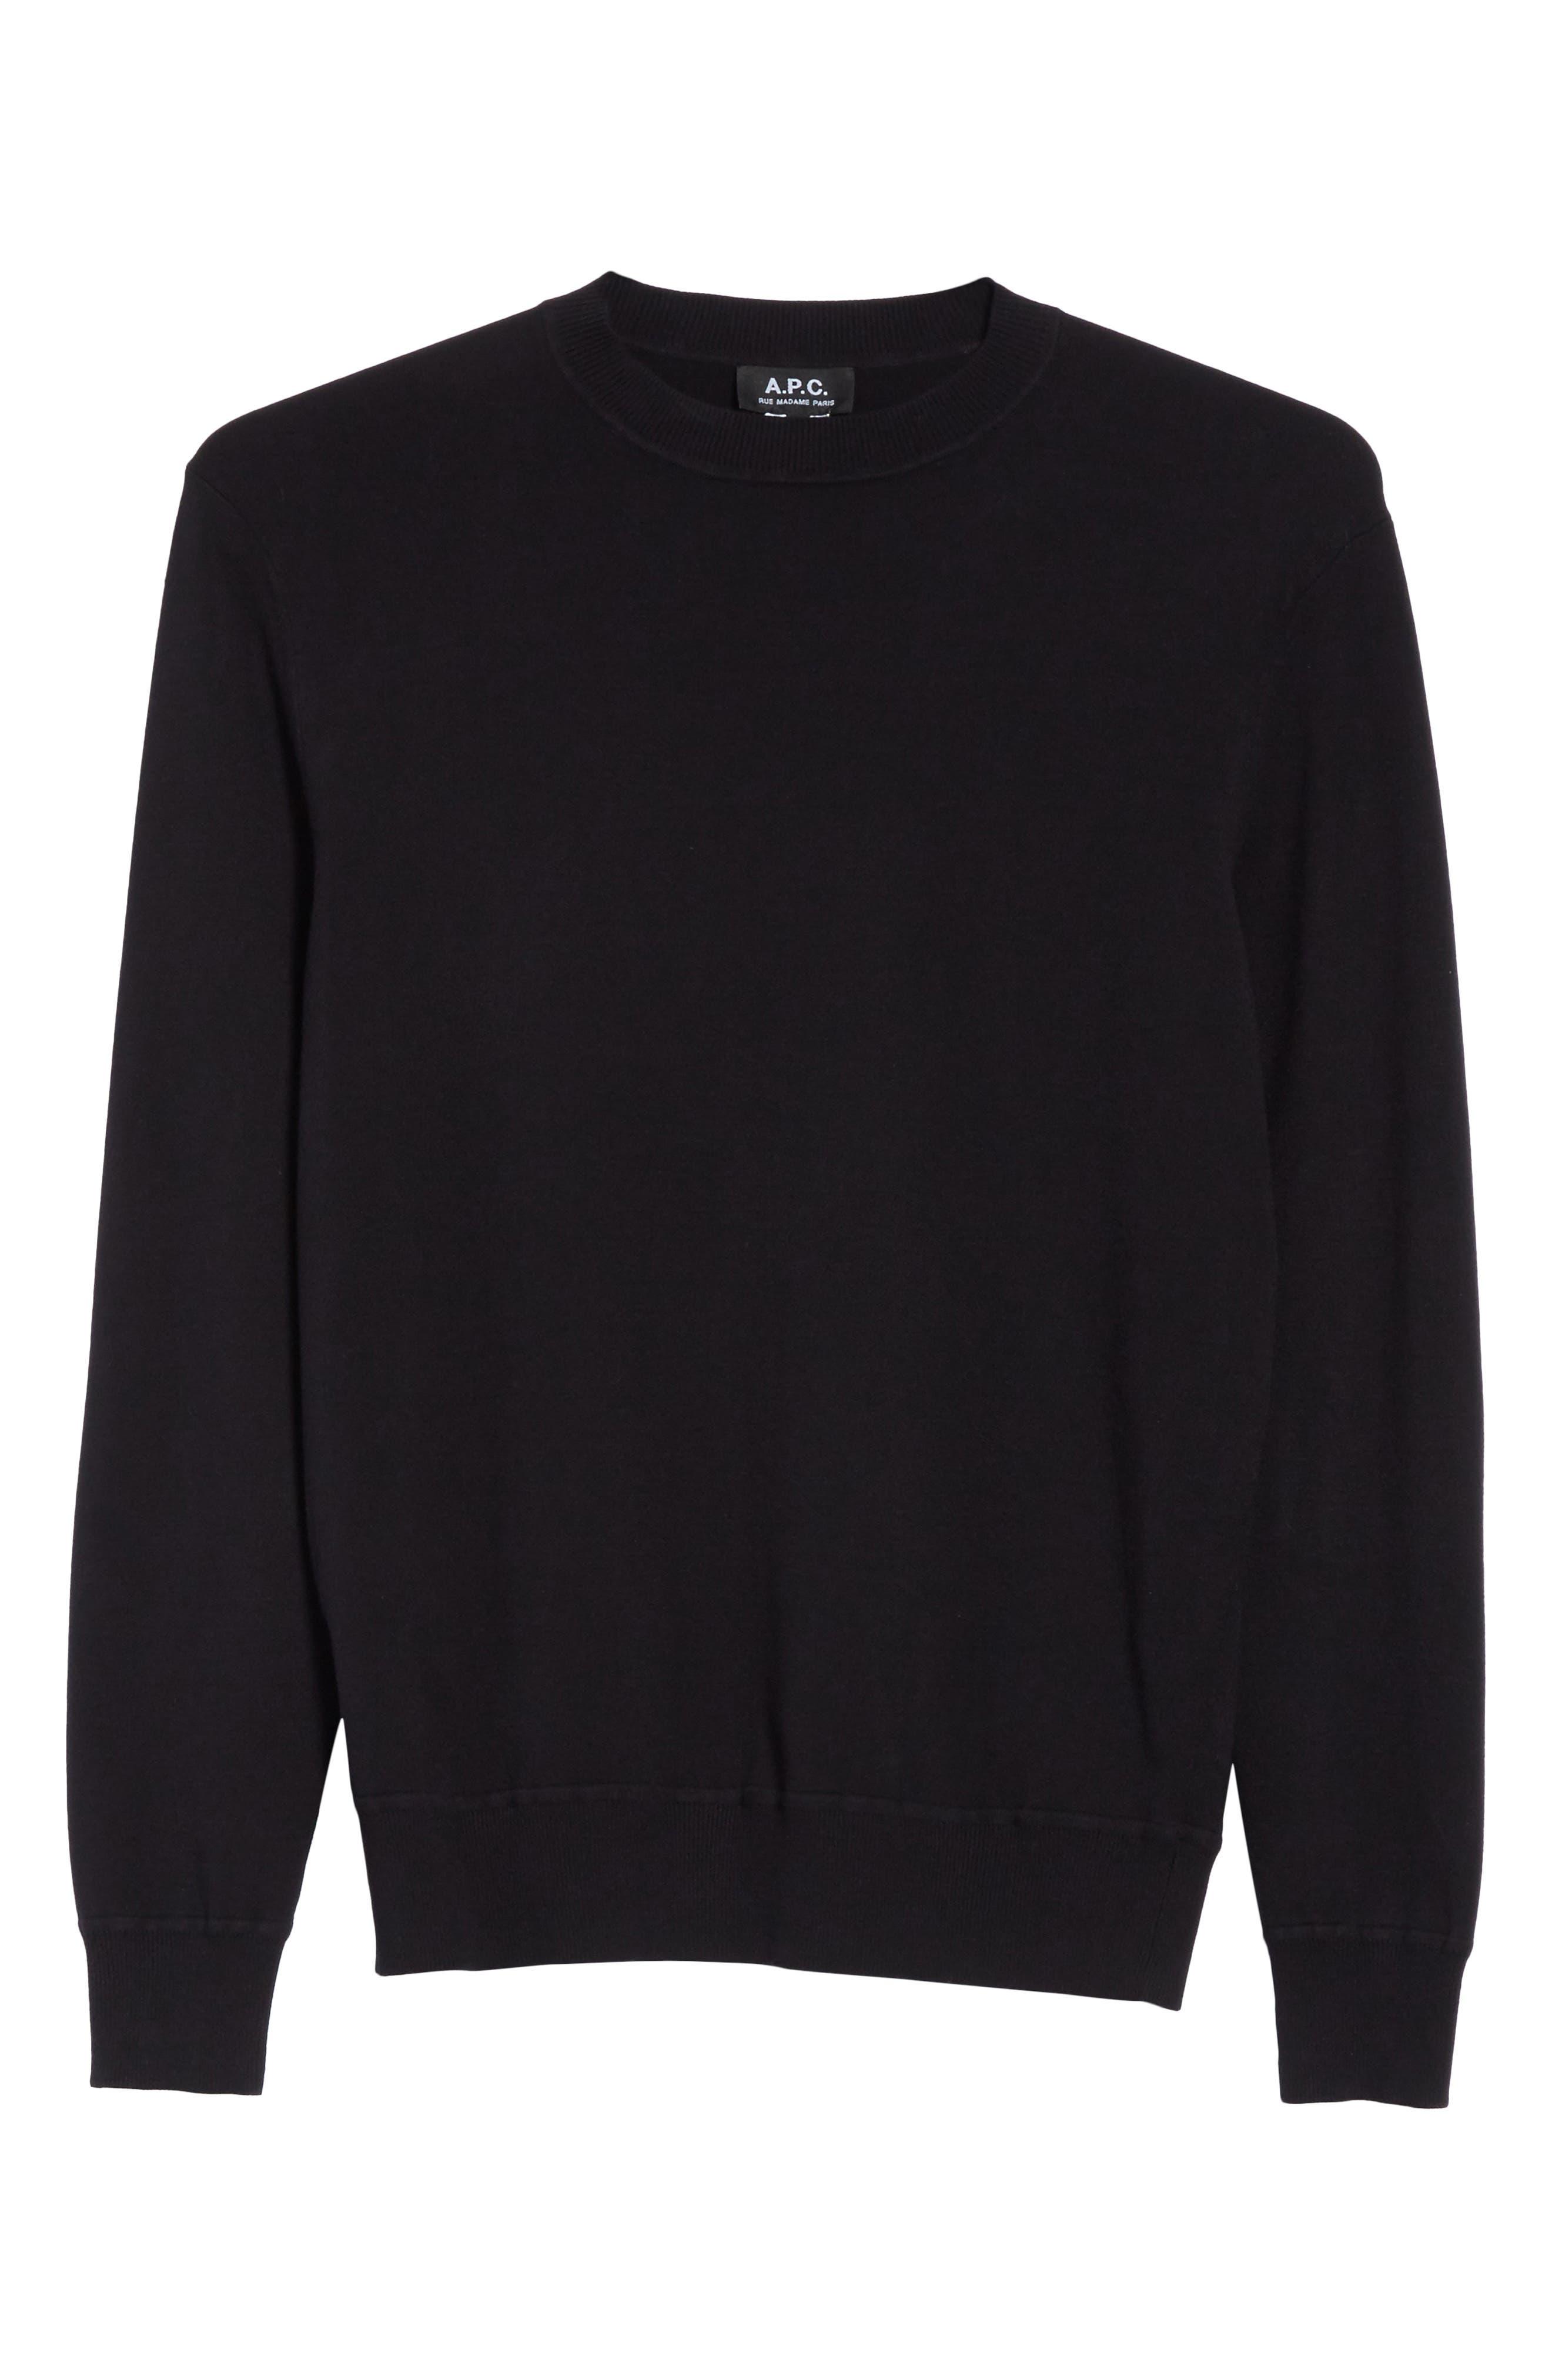 Ronnie Crewneck Sweatshirt,                             Alternate thumbnail 6, color,                             Black